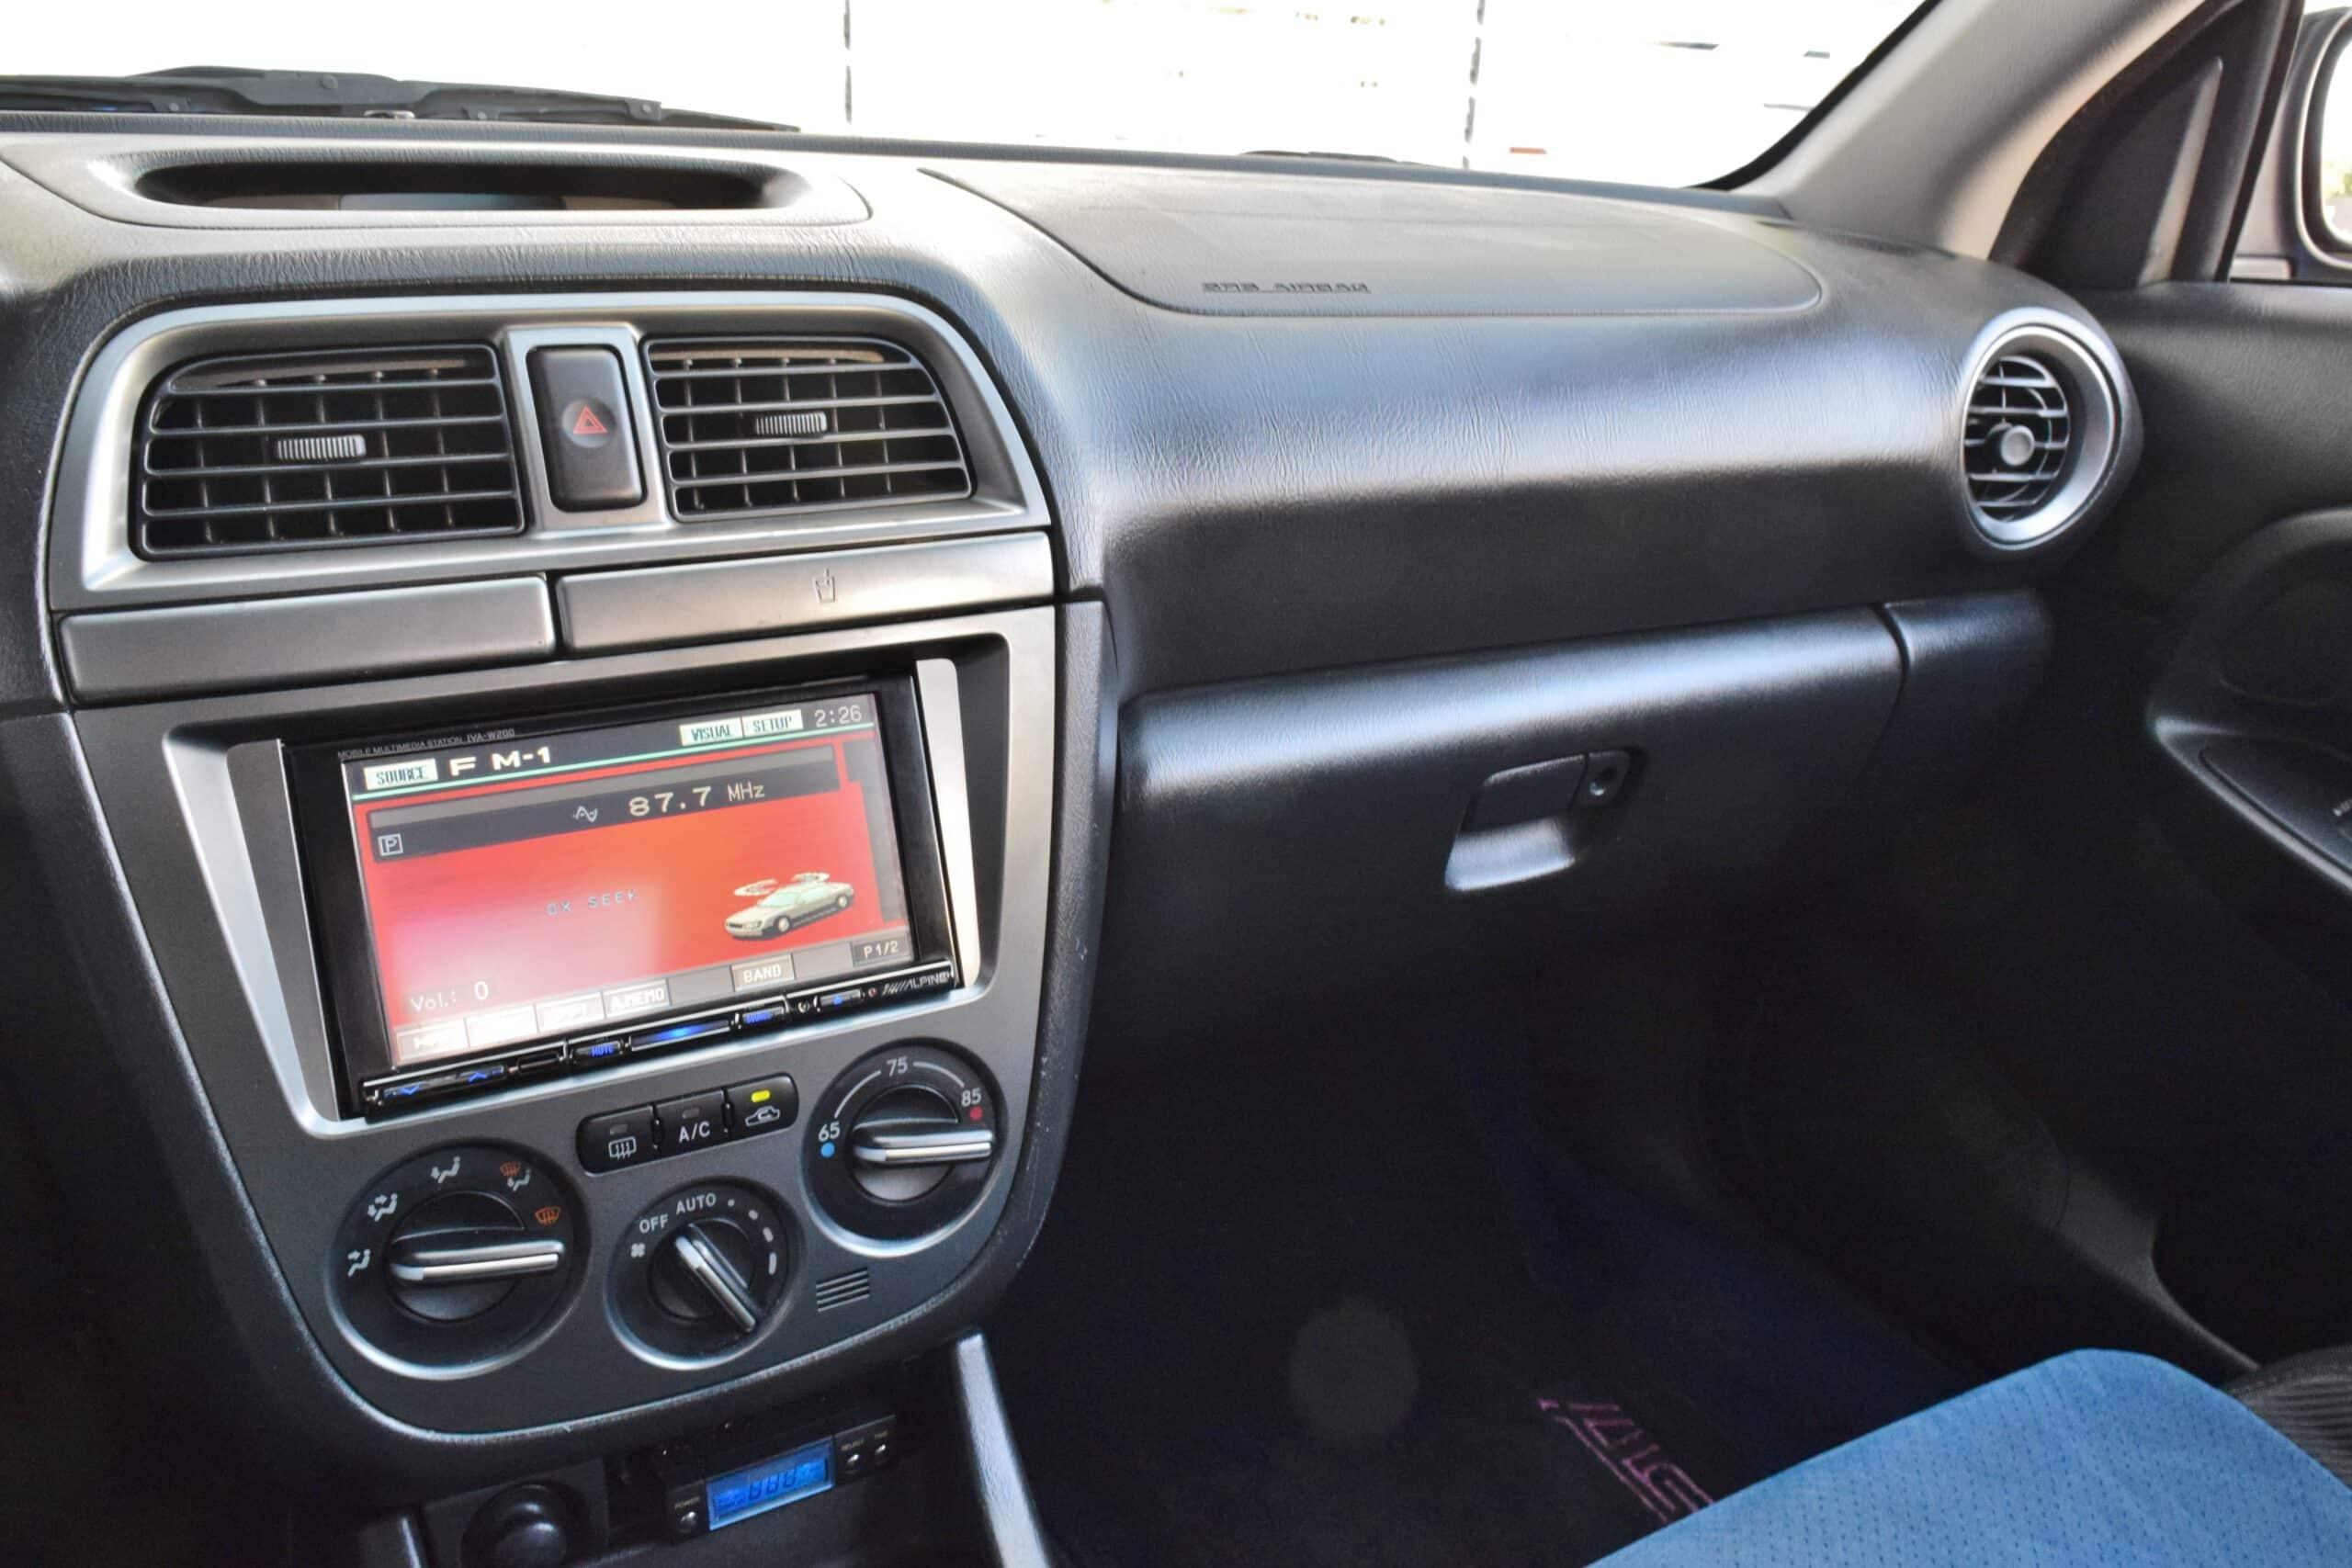 2004 Subaru WRX STI 1 Owner – Original Paint – Only 24K Miles – Built Motor – New Clutch – FAST!